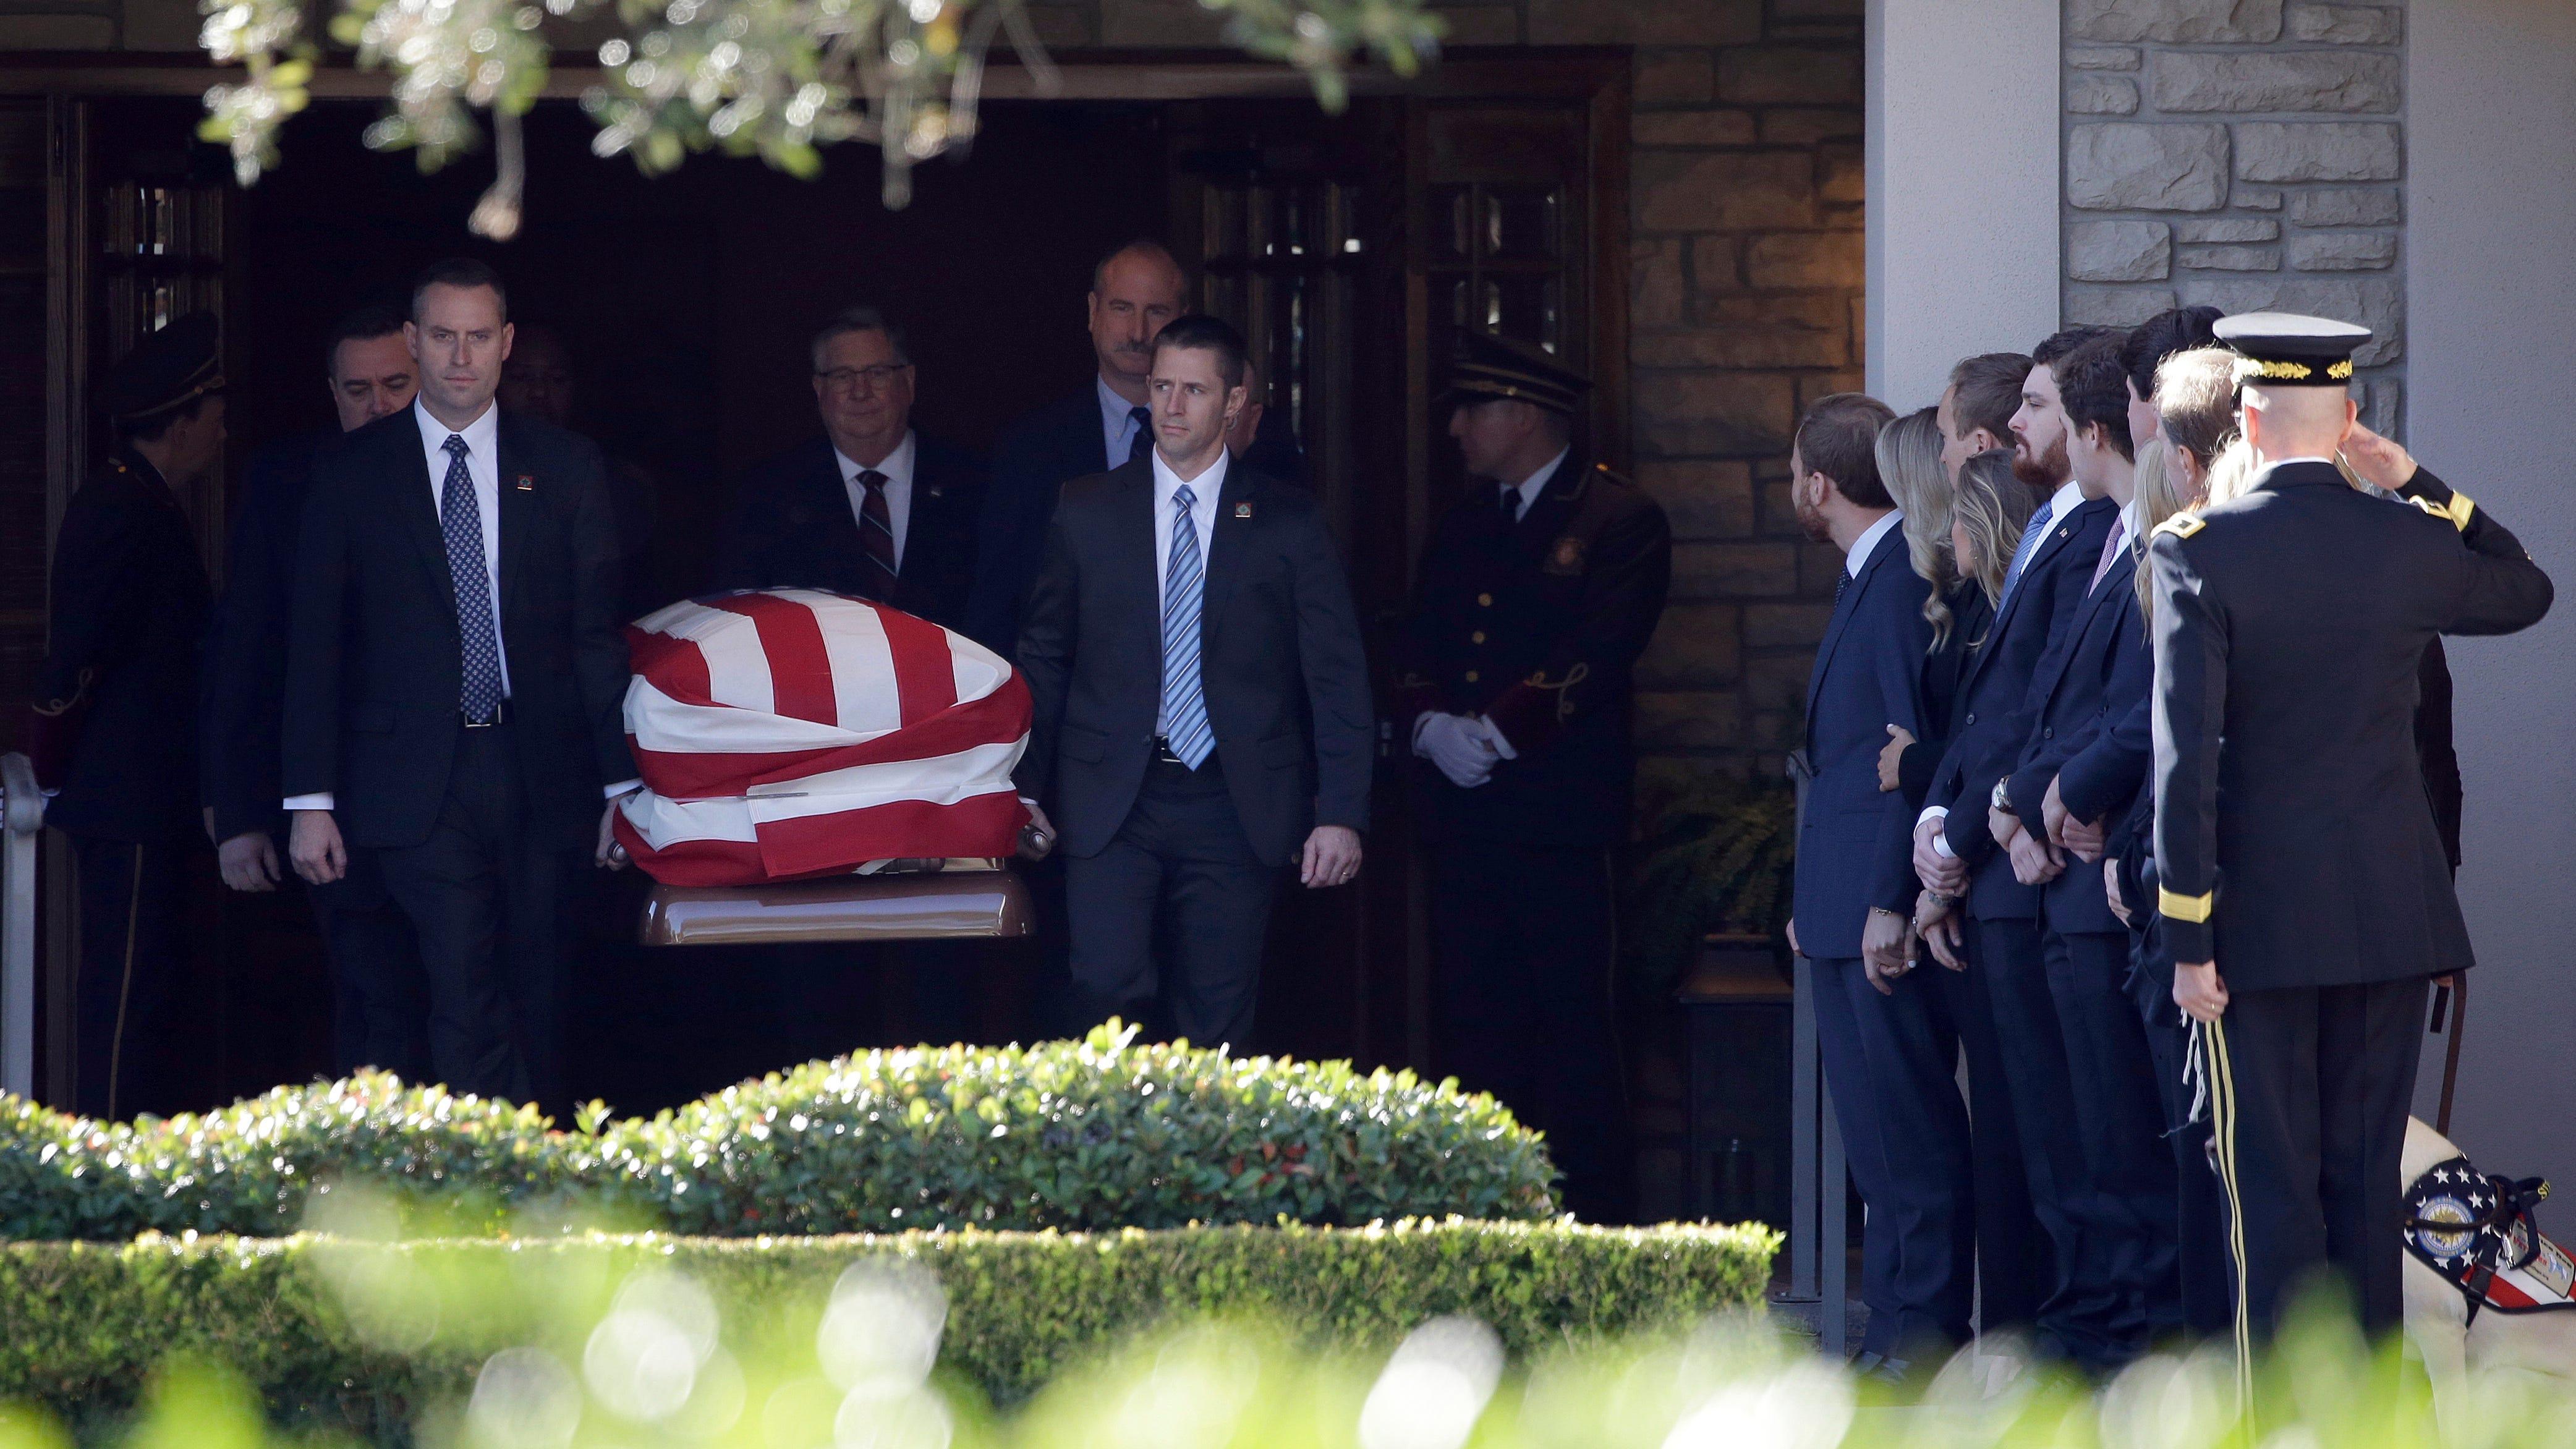 News Detail: Secret Service Finishes George H.W. Bush Security Detail